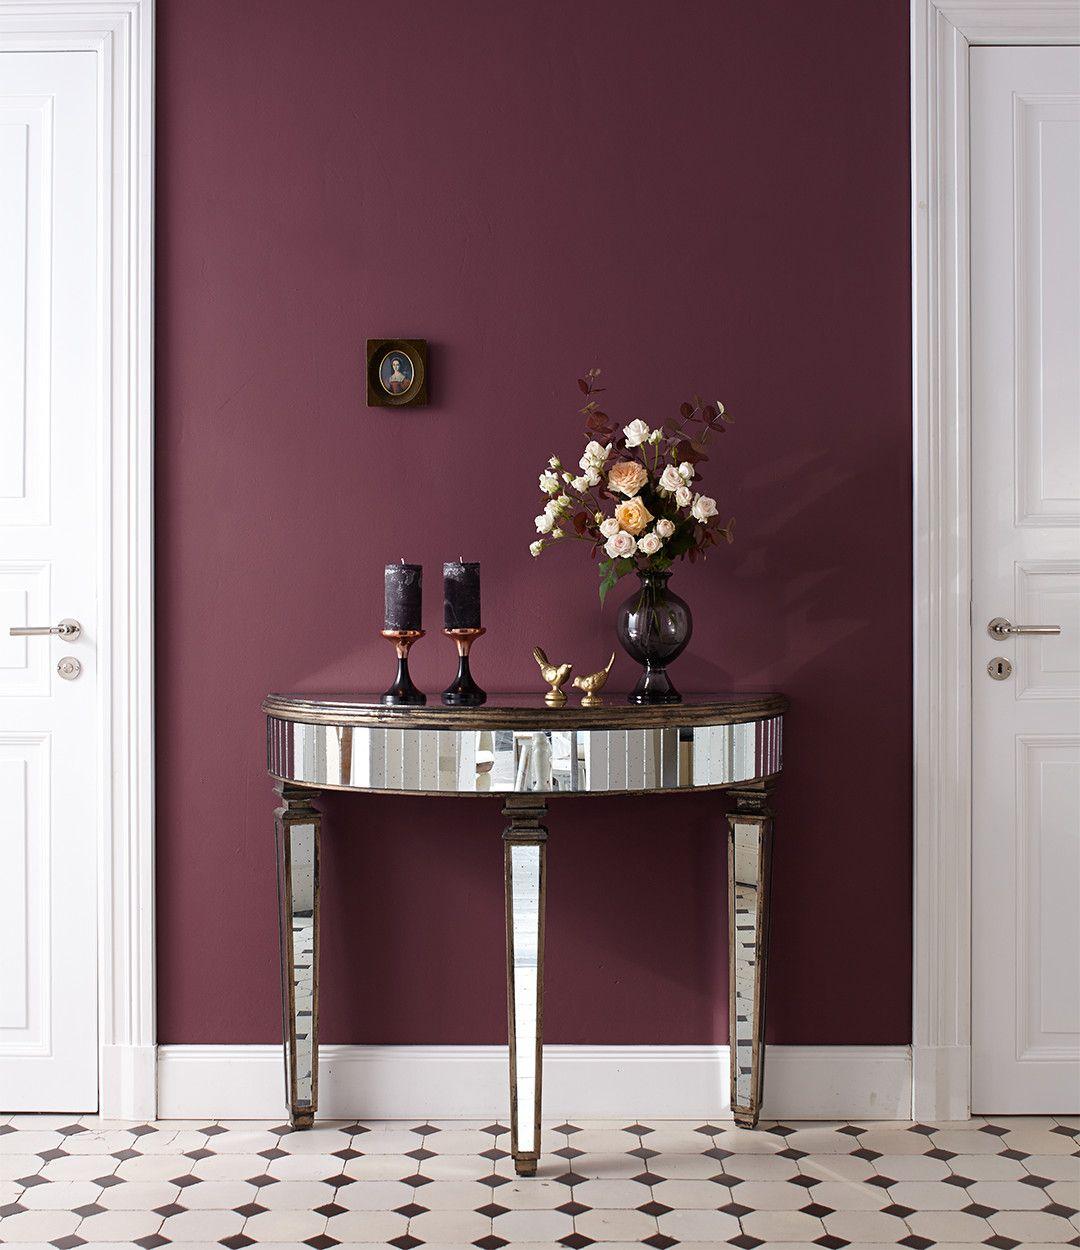 alpina feine farben no 17 farbe der k nige sorgt f r. Black Bedroom Furniture Sets. Home Design Ideas